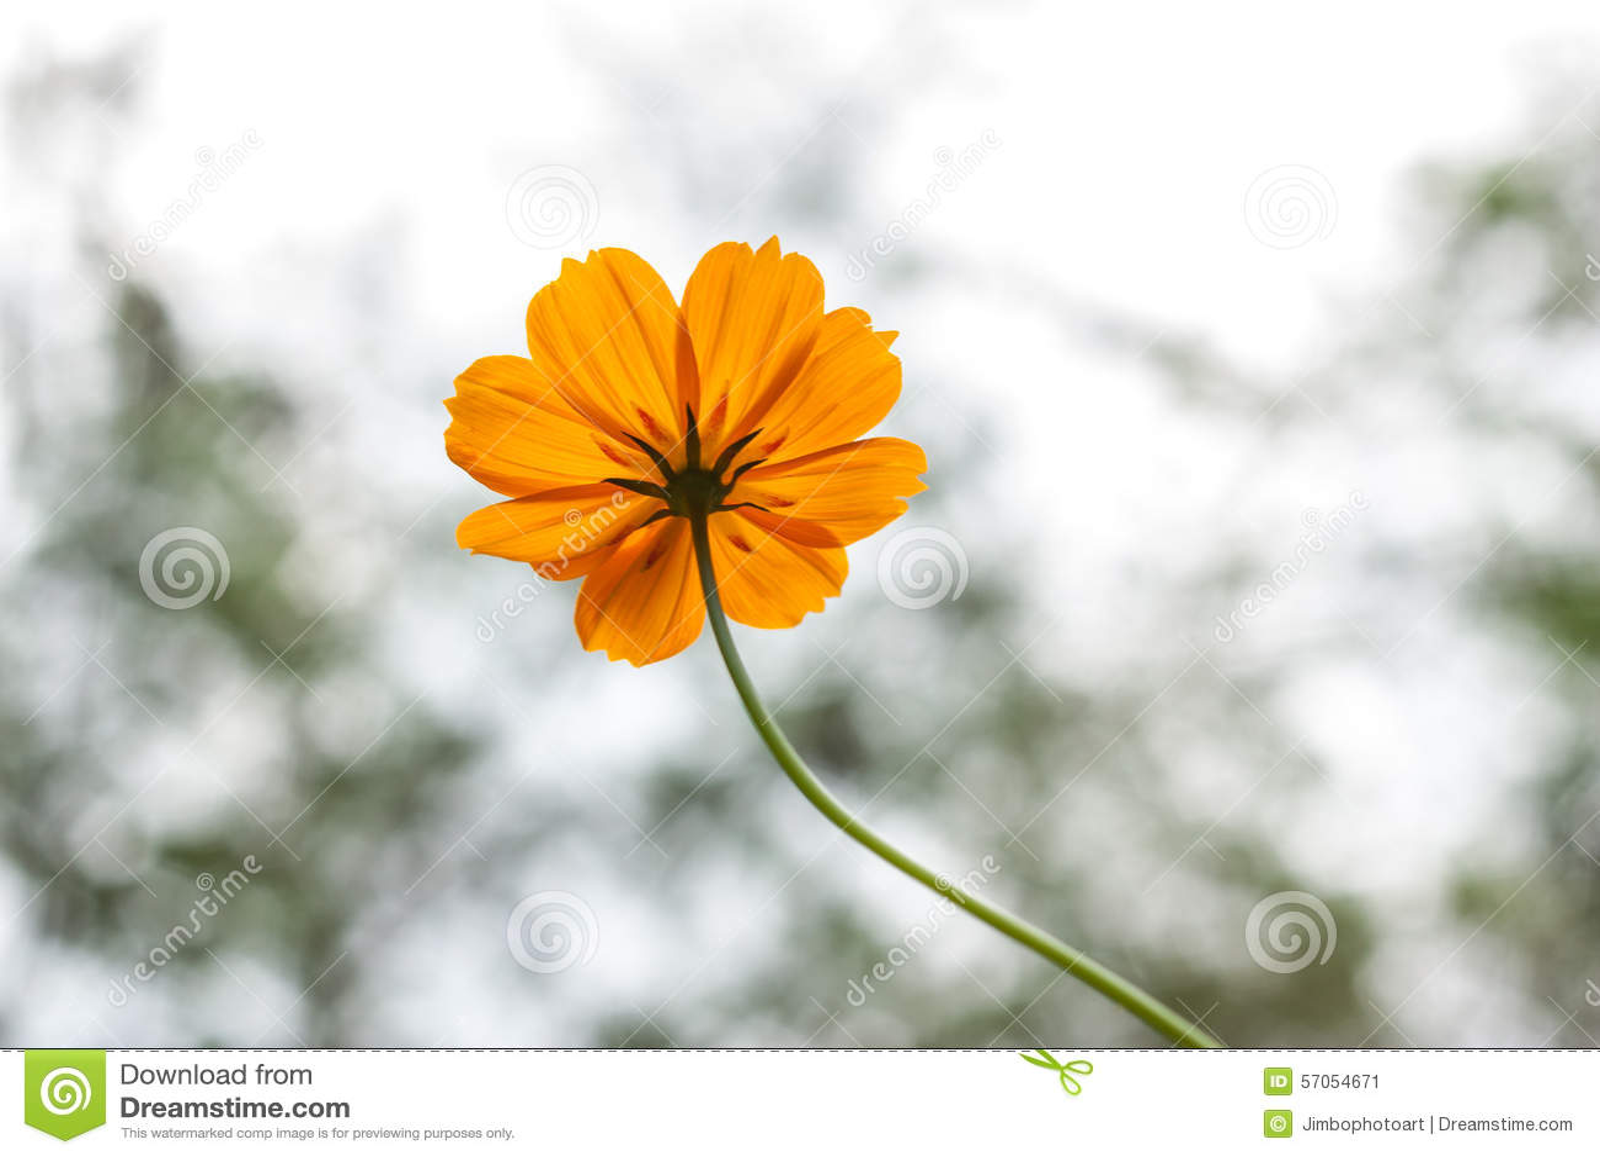 Gele bloem met bokehlicht